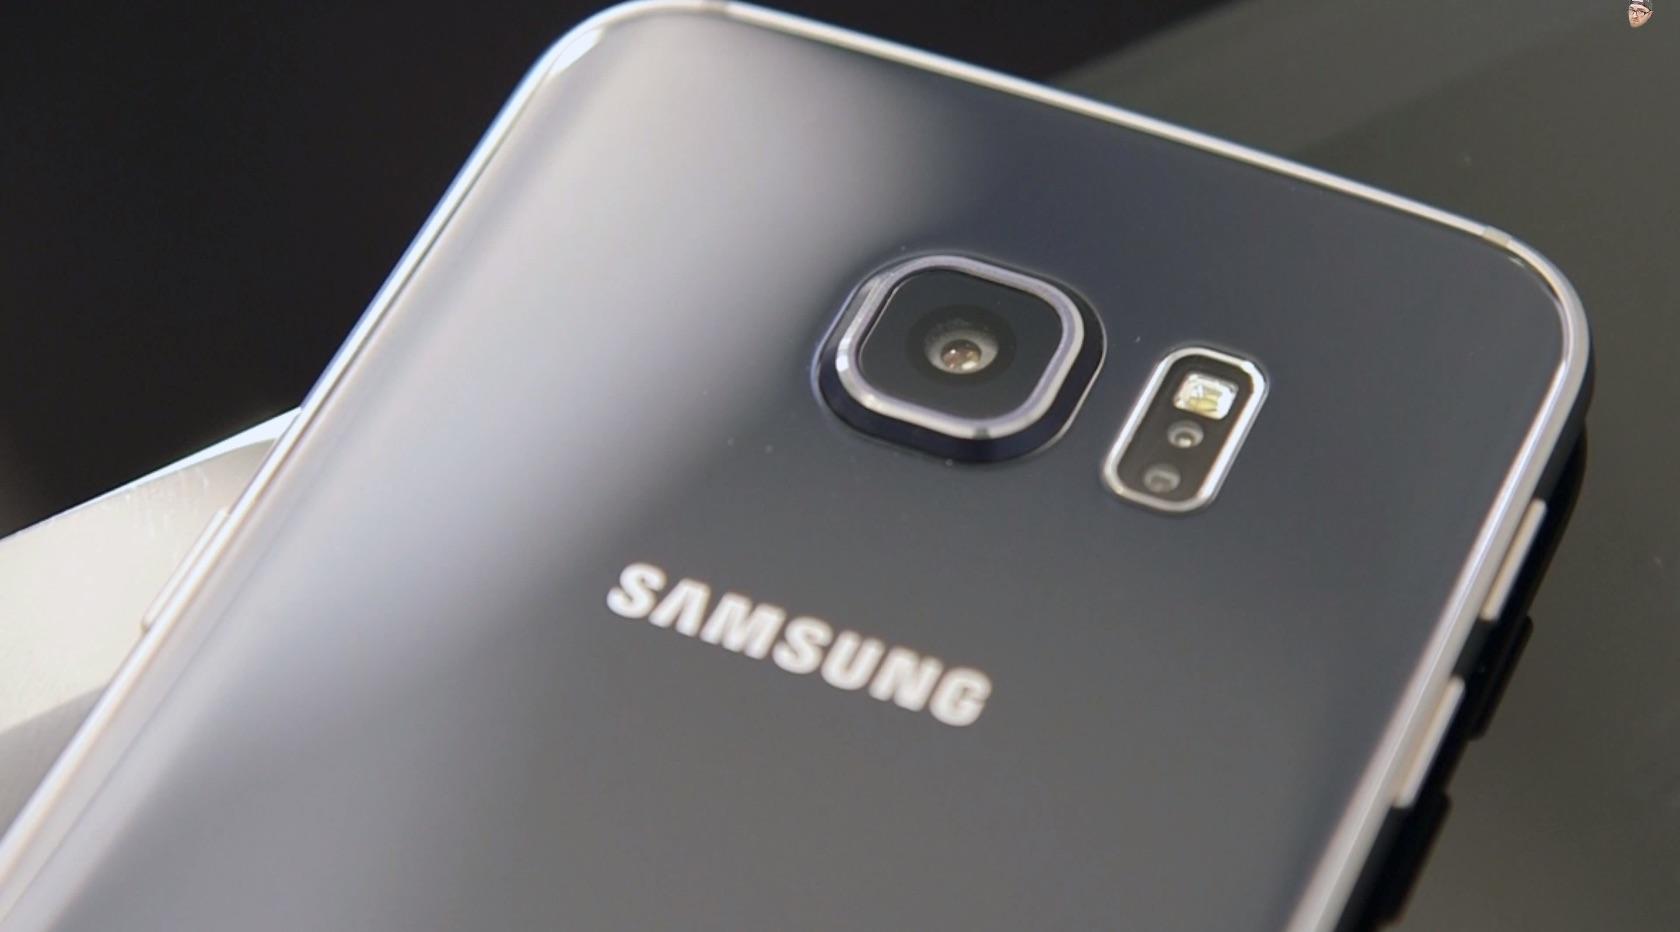 Samsung Galaxy S6 design carcasa